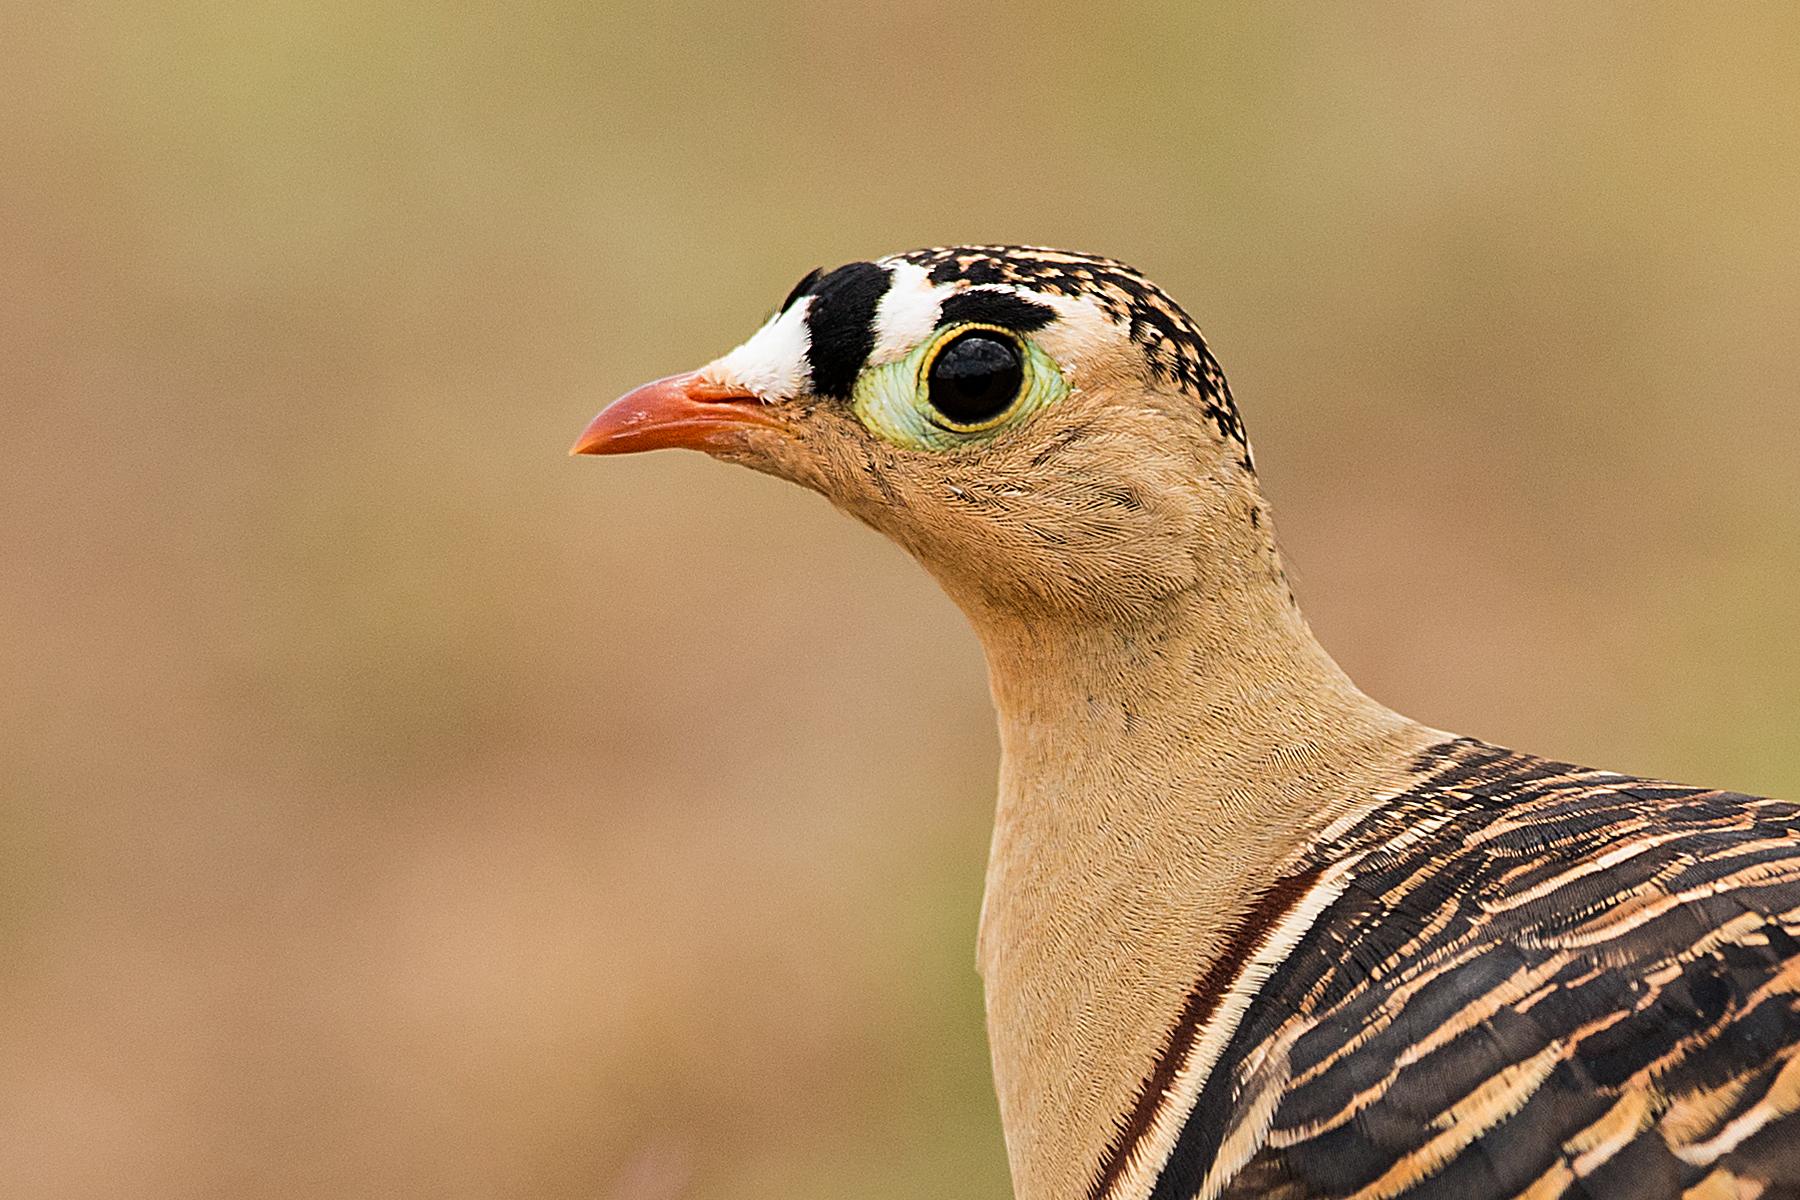 Painted sandgrouse - male